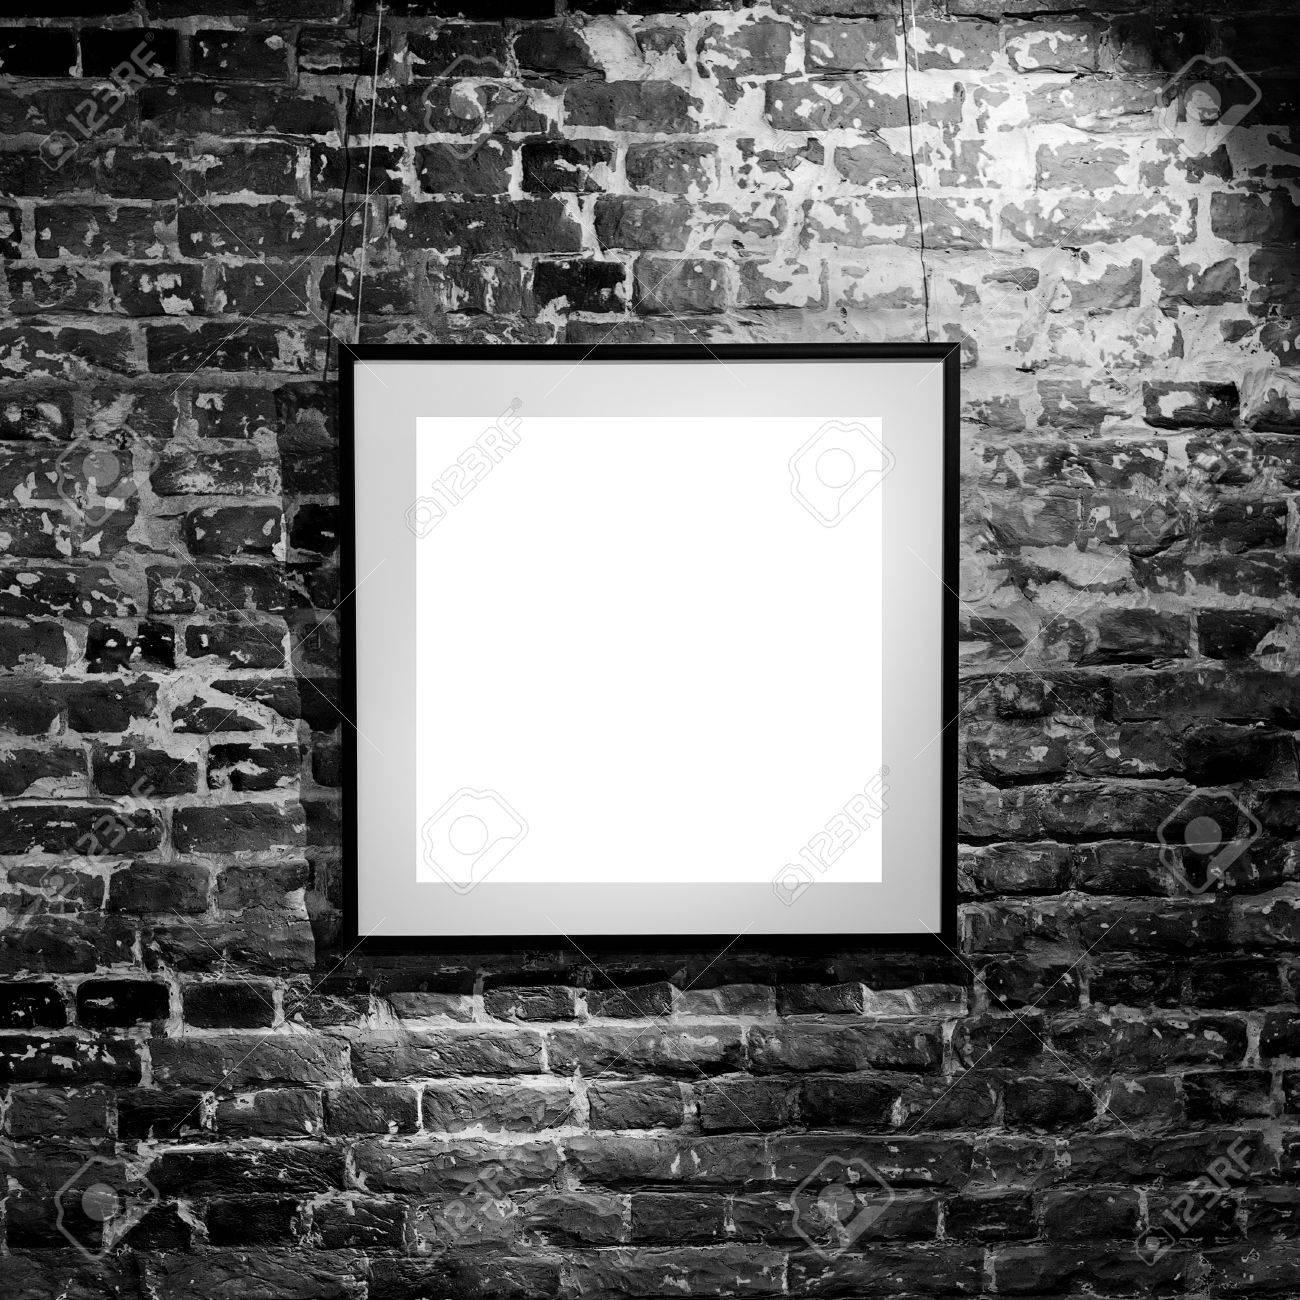 Details about  /Framed Mini Poster Spaced Out Black Wooden Framed Print 35x45cm